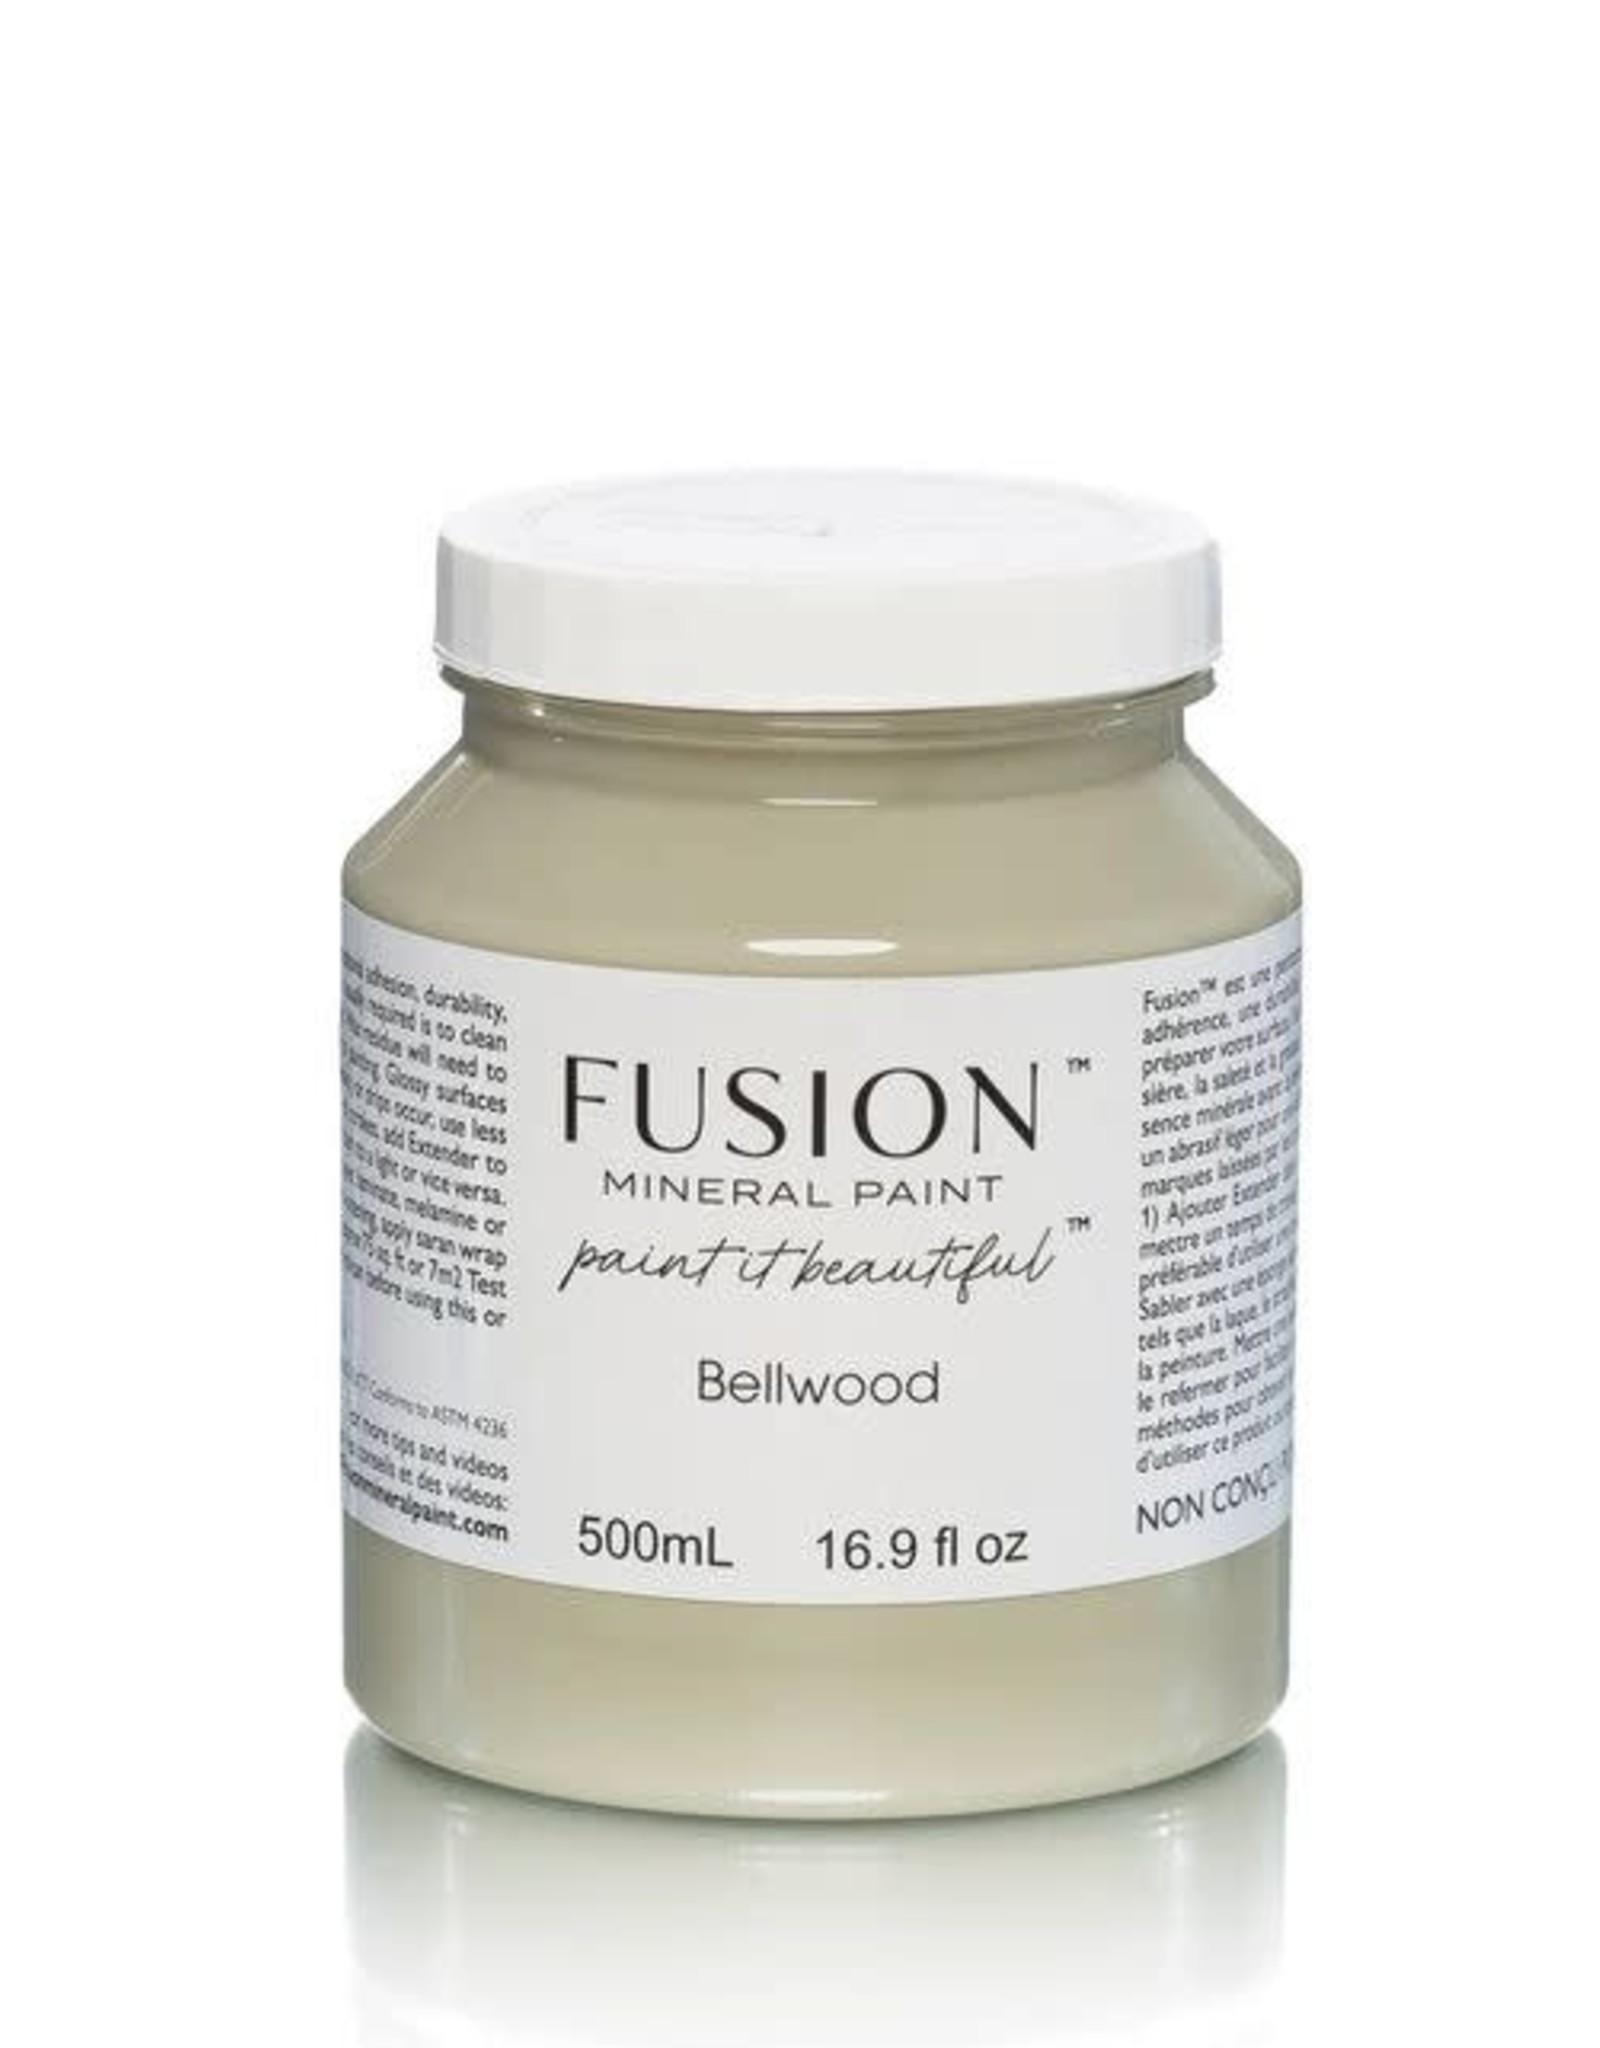 Fusion Mineral Paint Fusion Mineral Paint - Bellwood 500ml